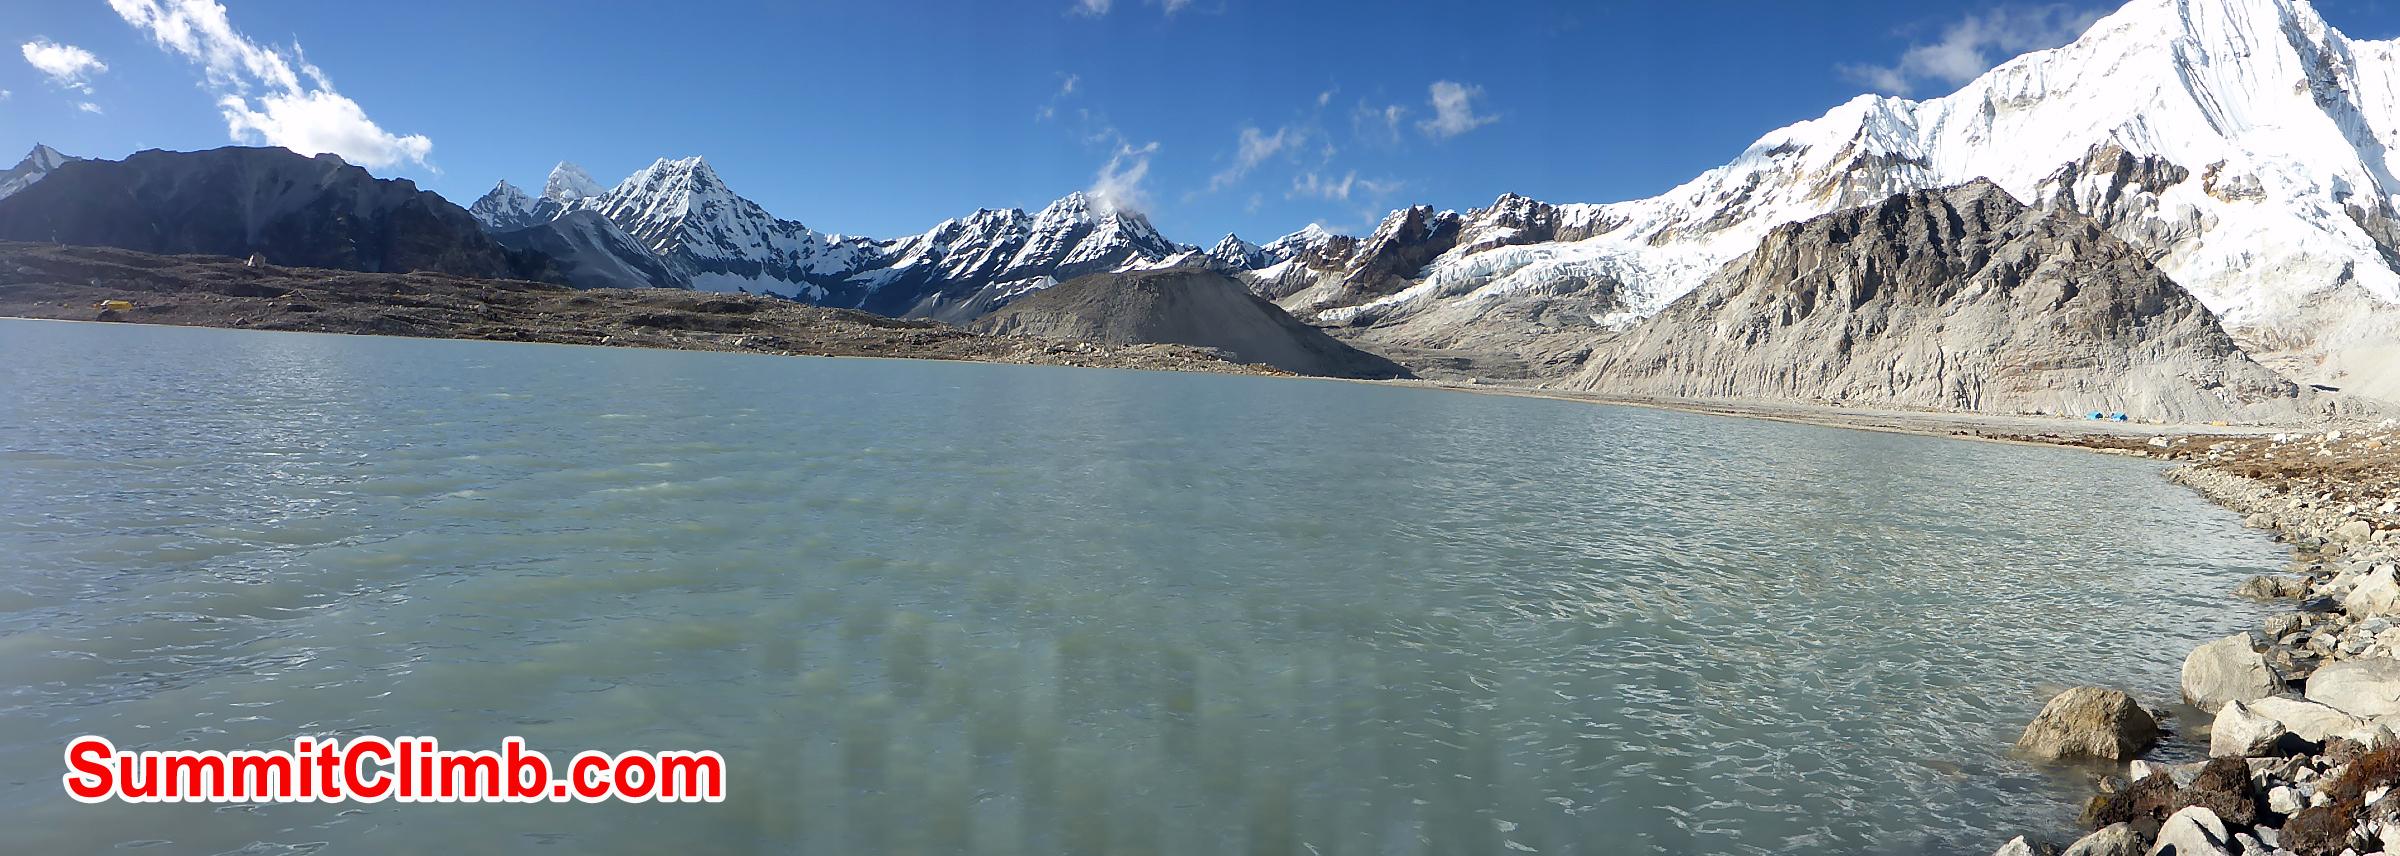 Glacier lake surround by himalayas